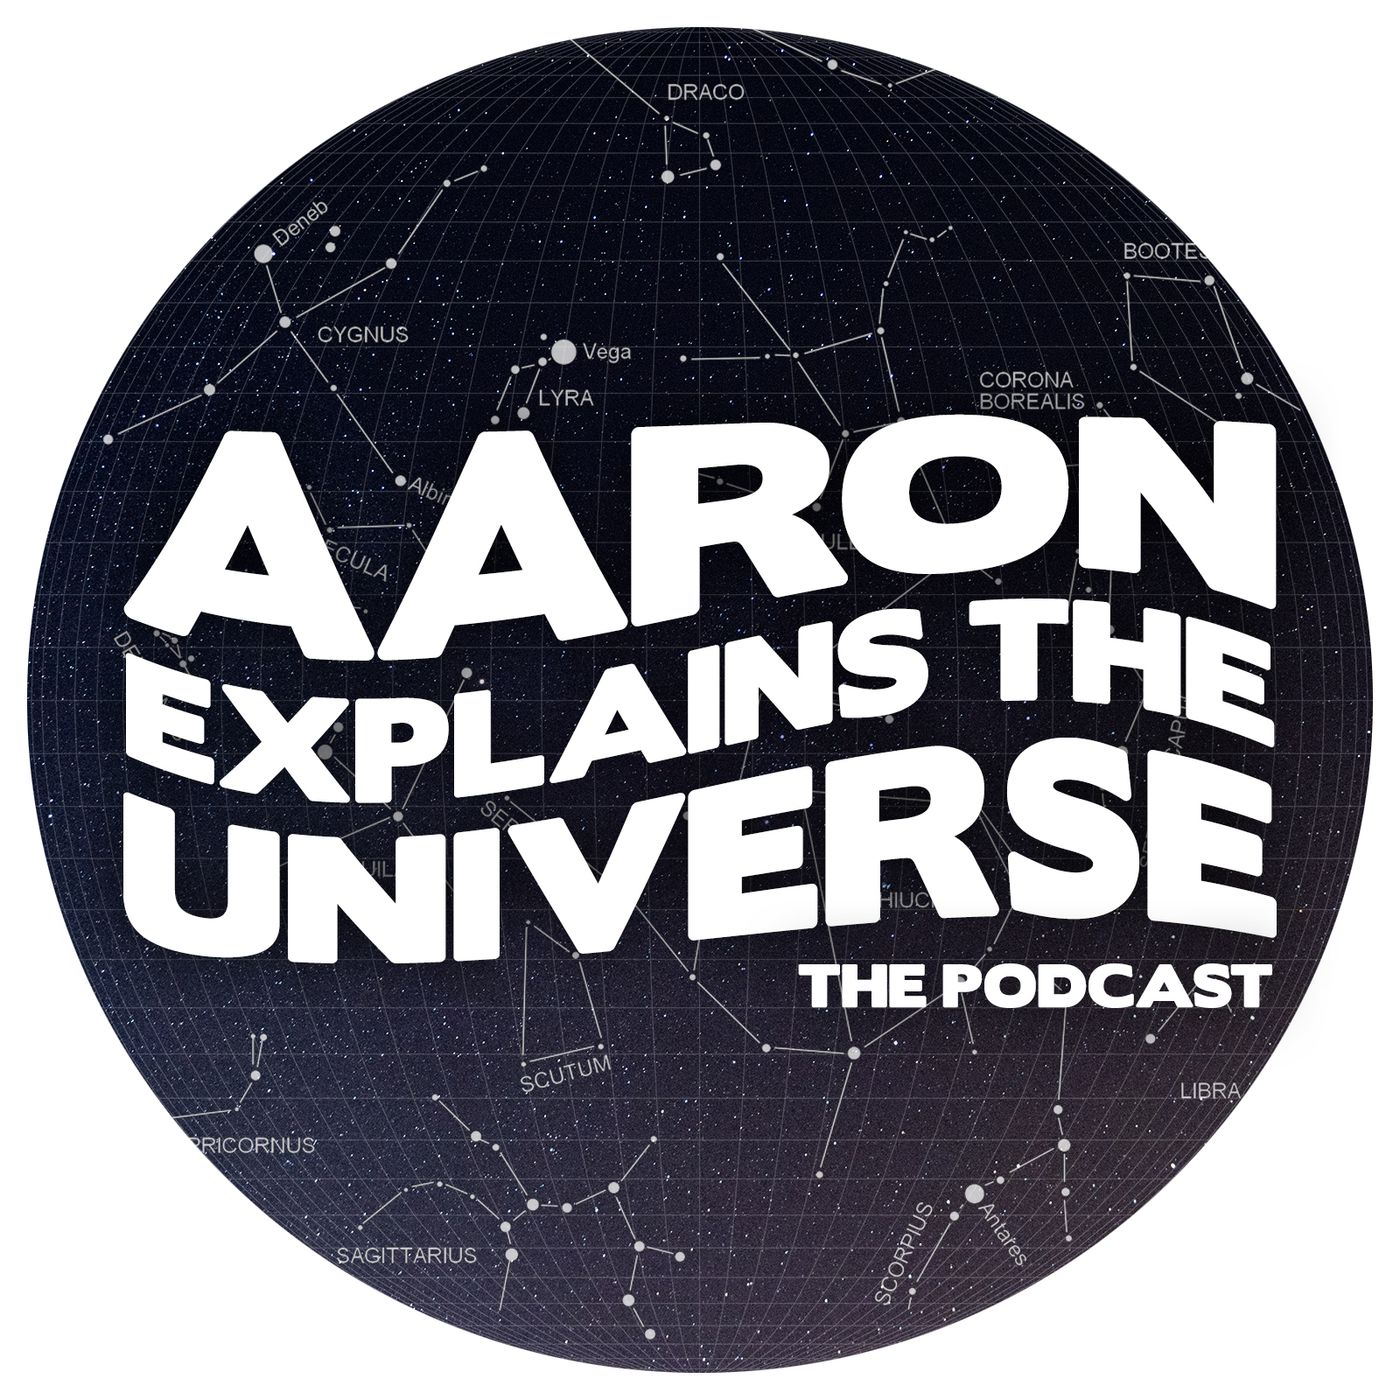 Aaron Explains the Universe